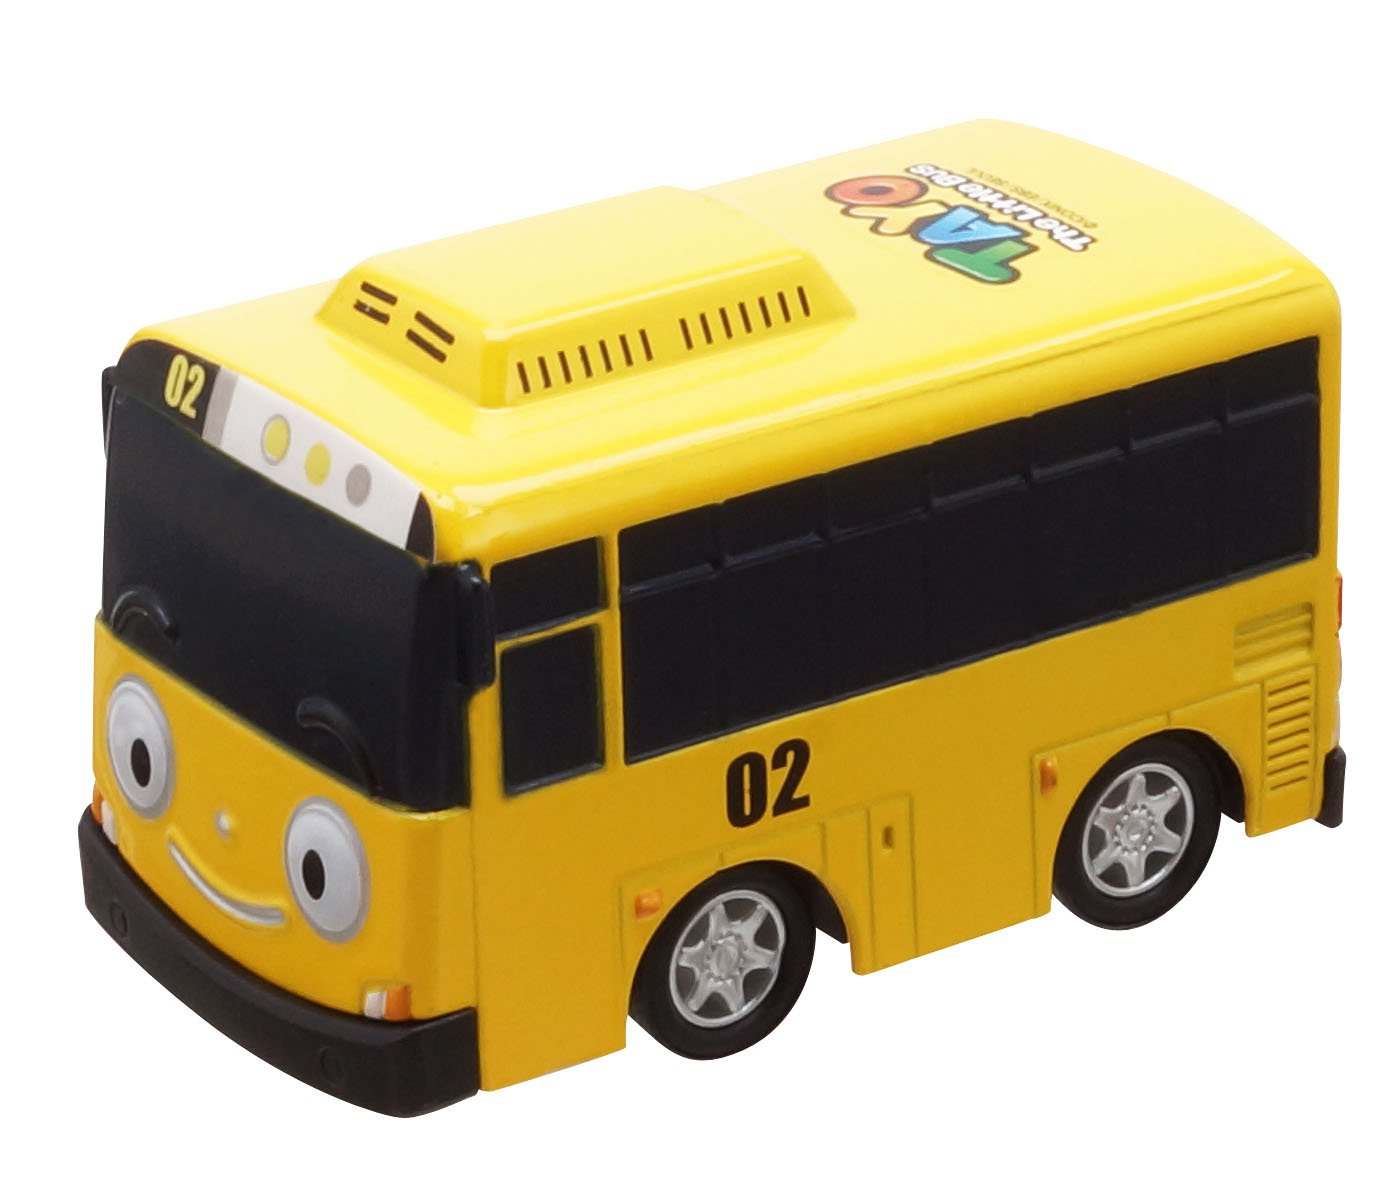 Tayo the Little Bus, 4 Metal Vehicles Set, Pull Back Mini Cars